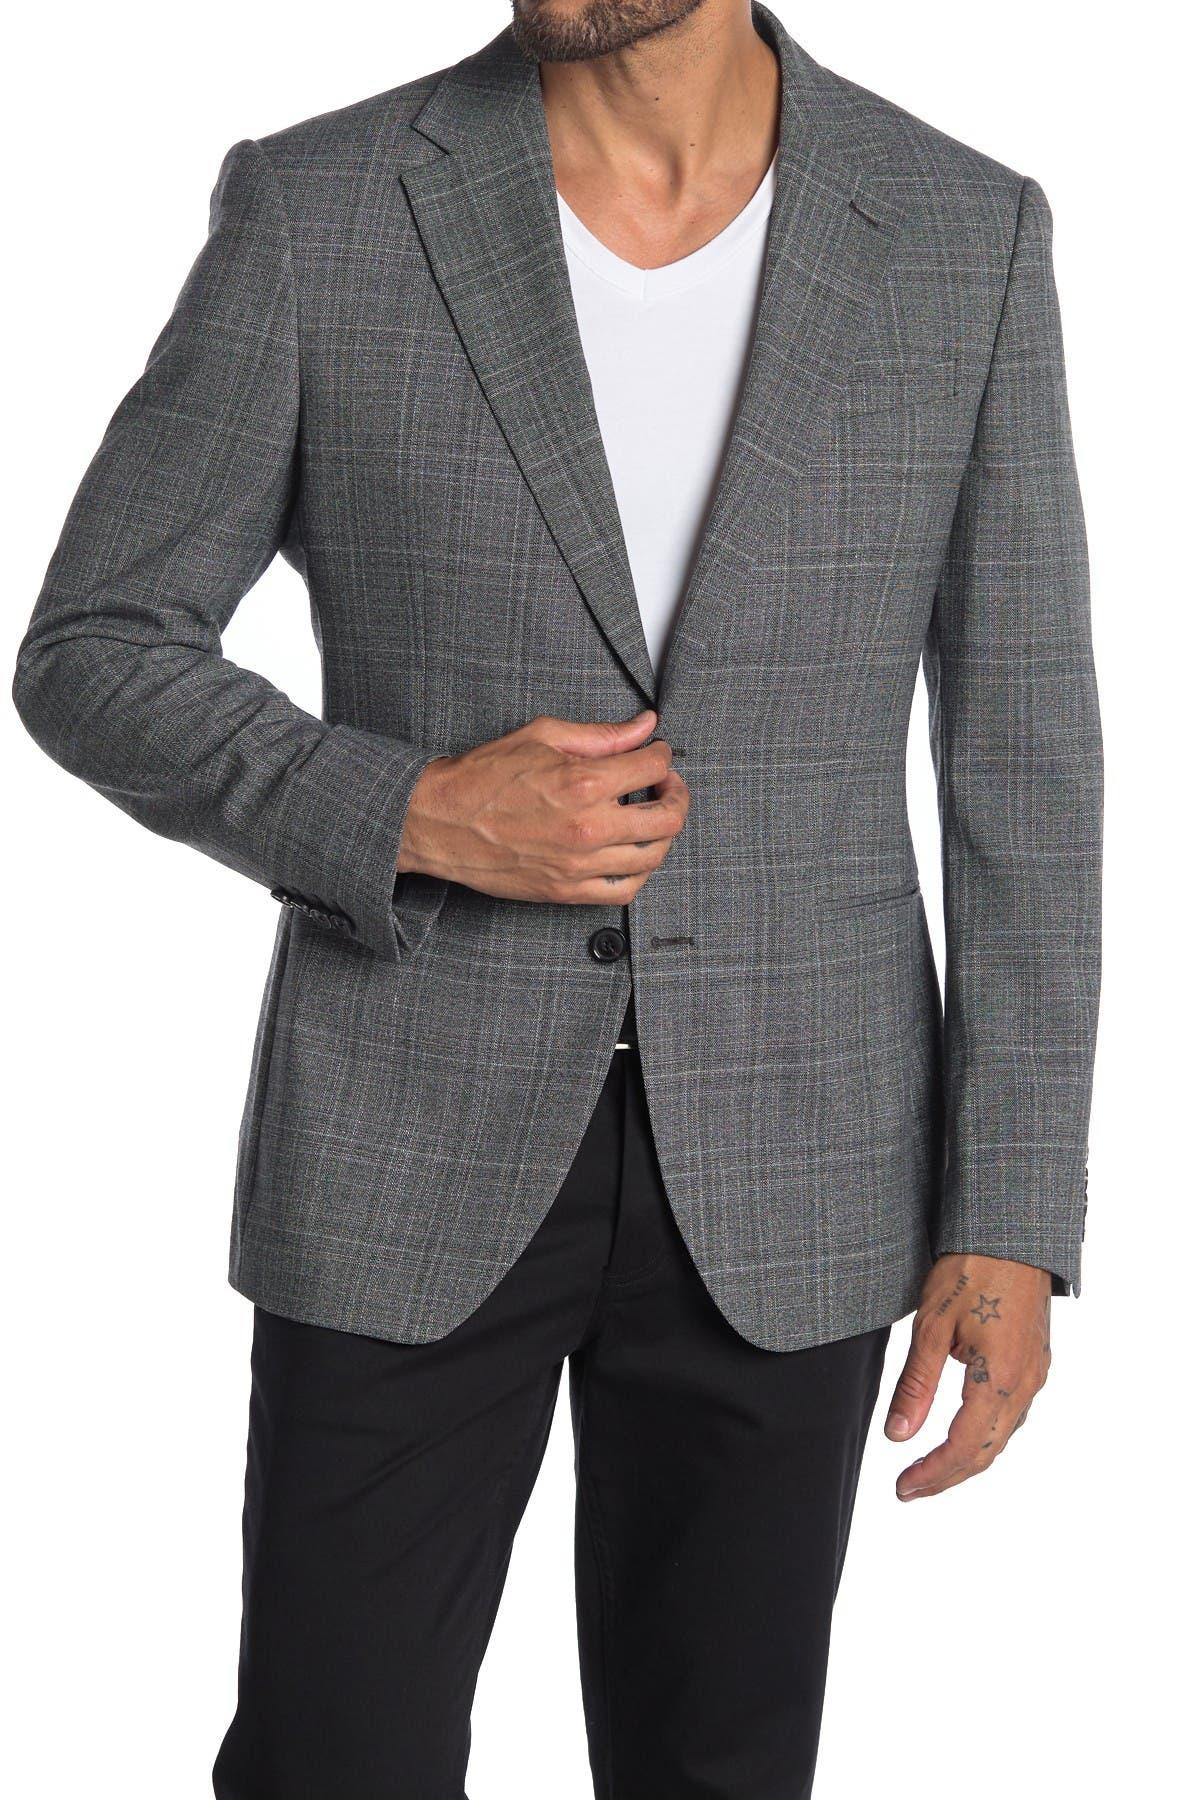 Image of REISS Lafite Grey Plaid Two Button Notch Lapel Modern Fit Suit Separates Blazer